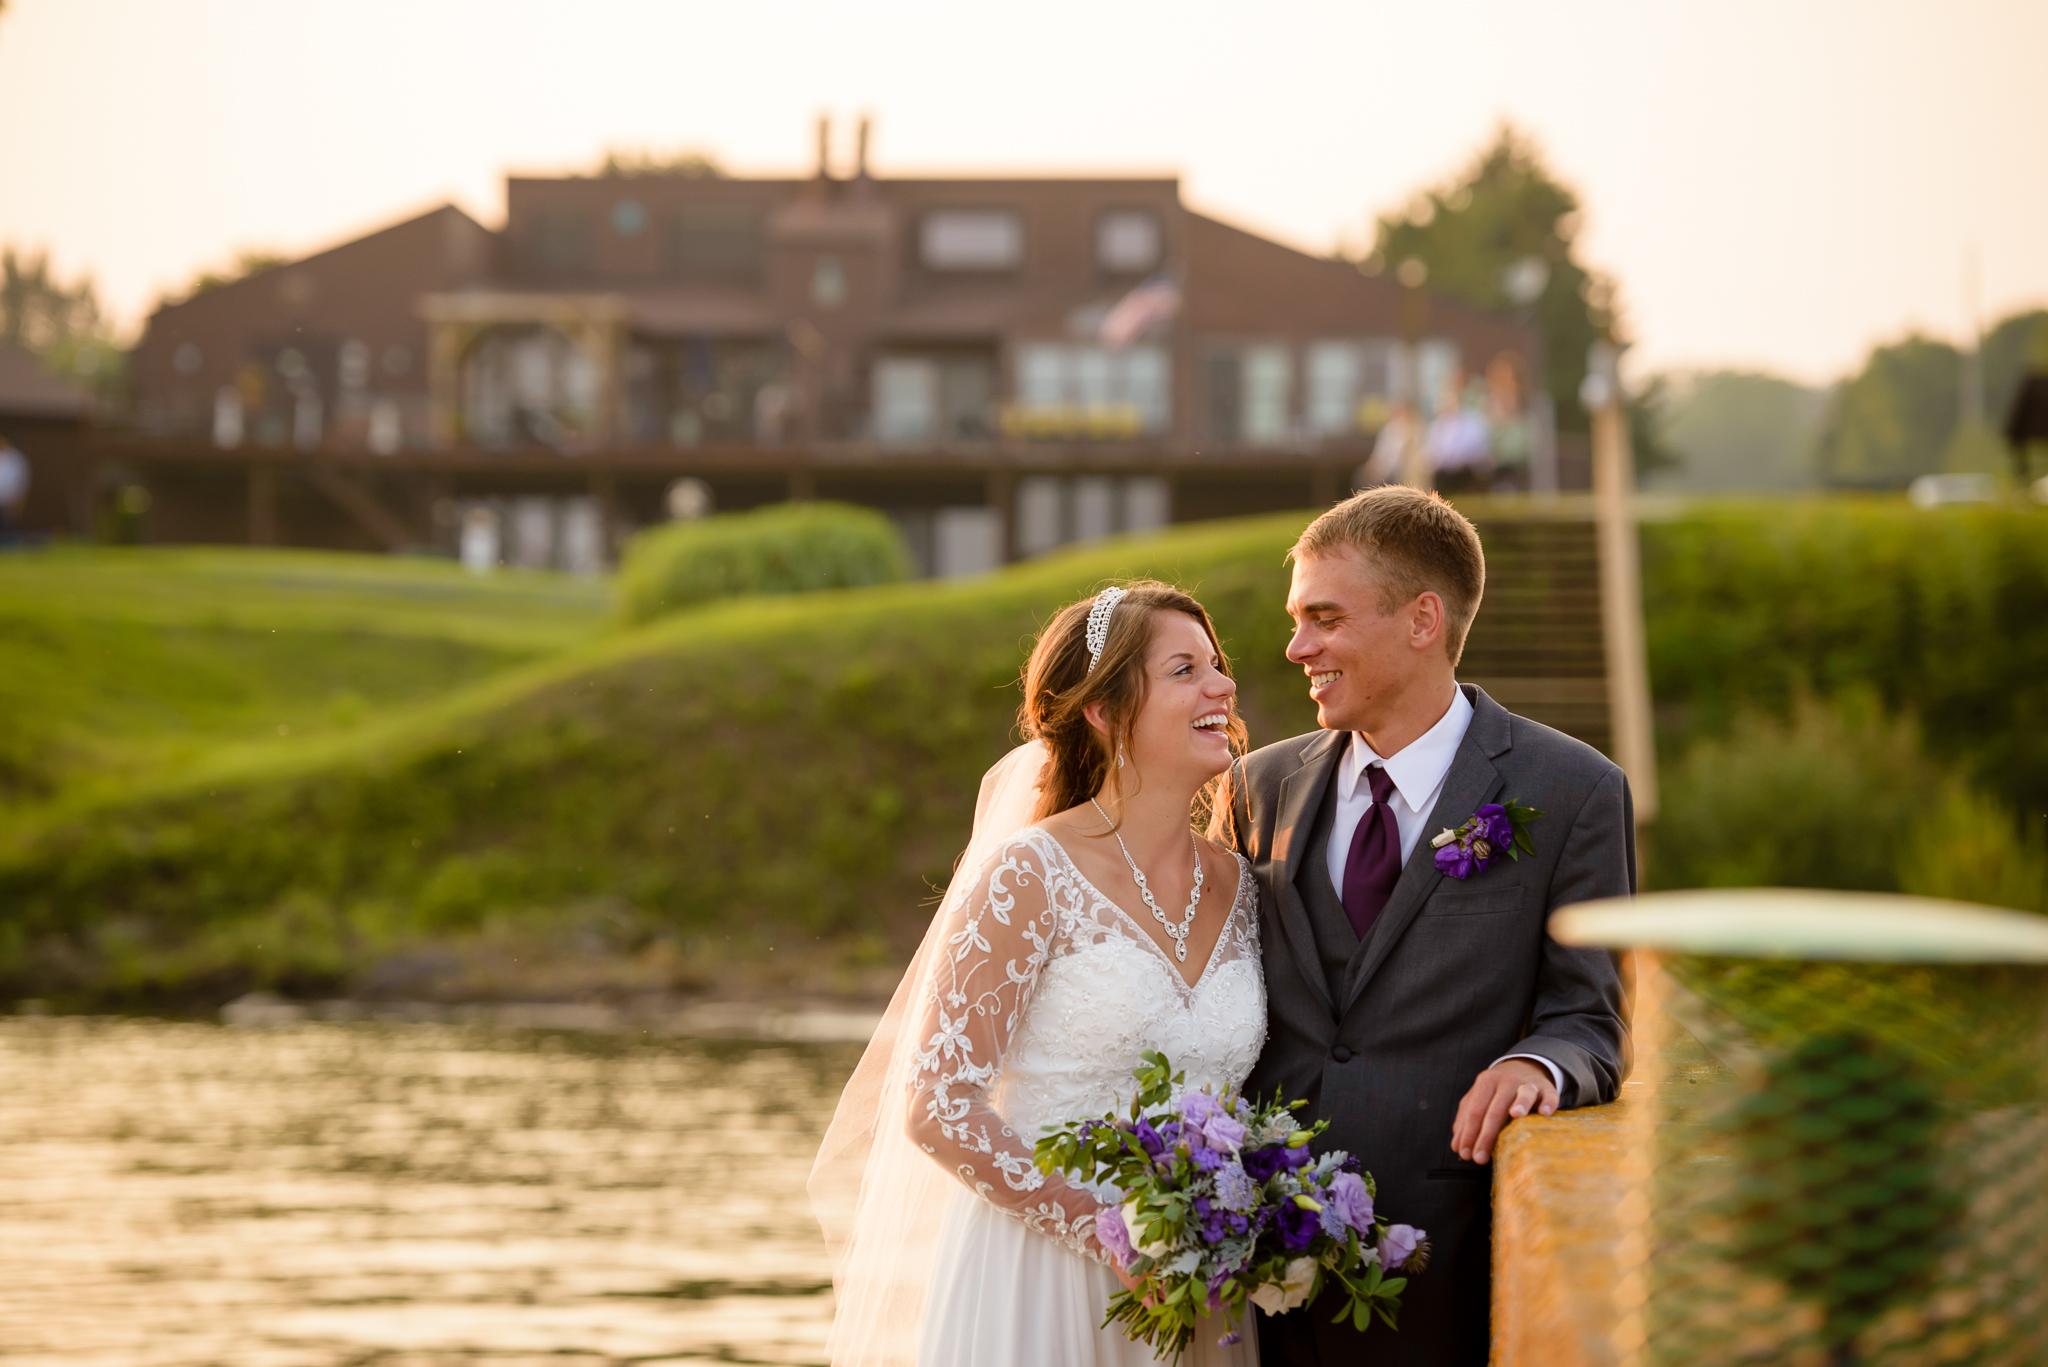 43-ashland washburn wedding photographyDSC_5917.jpg